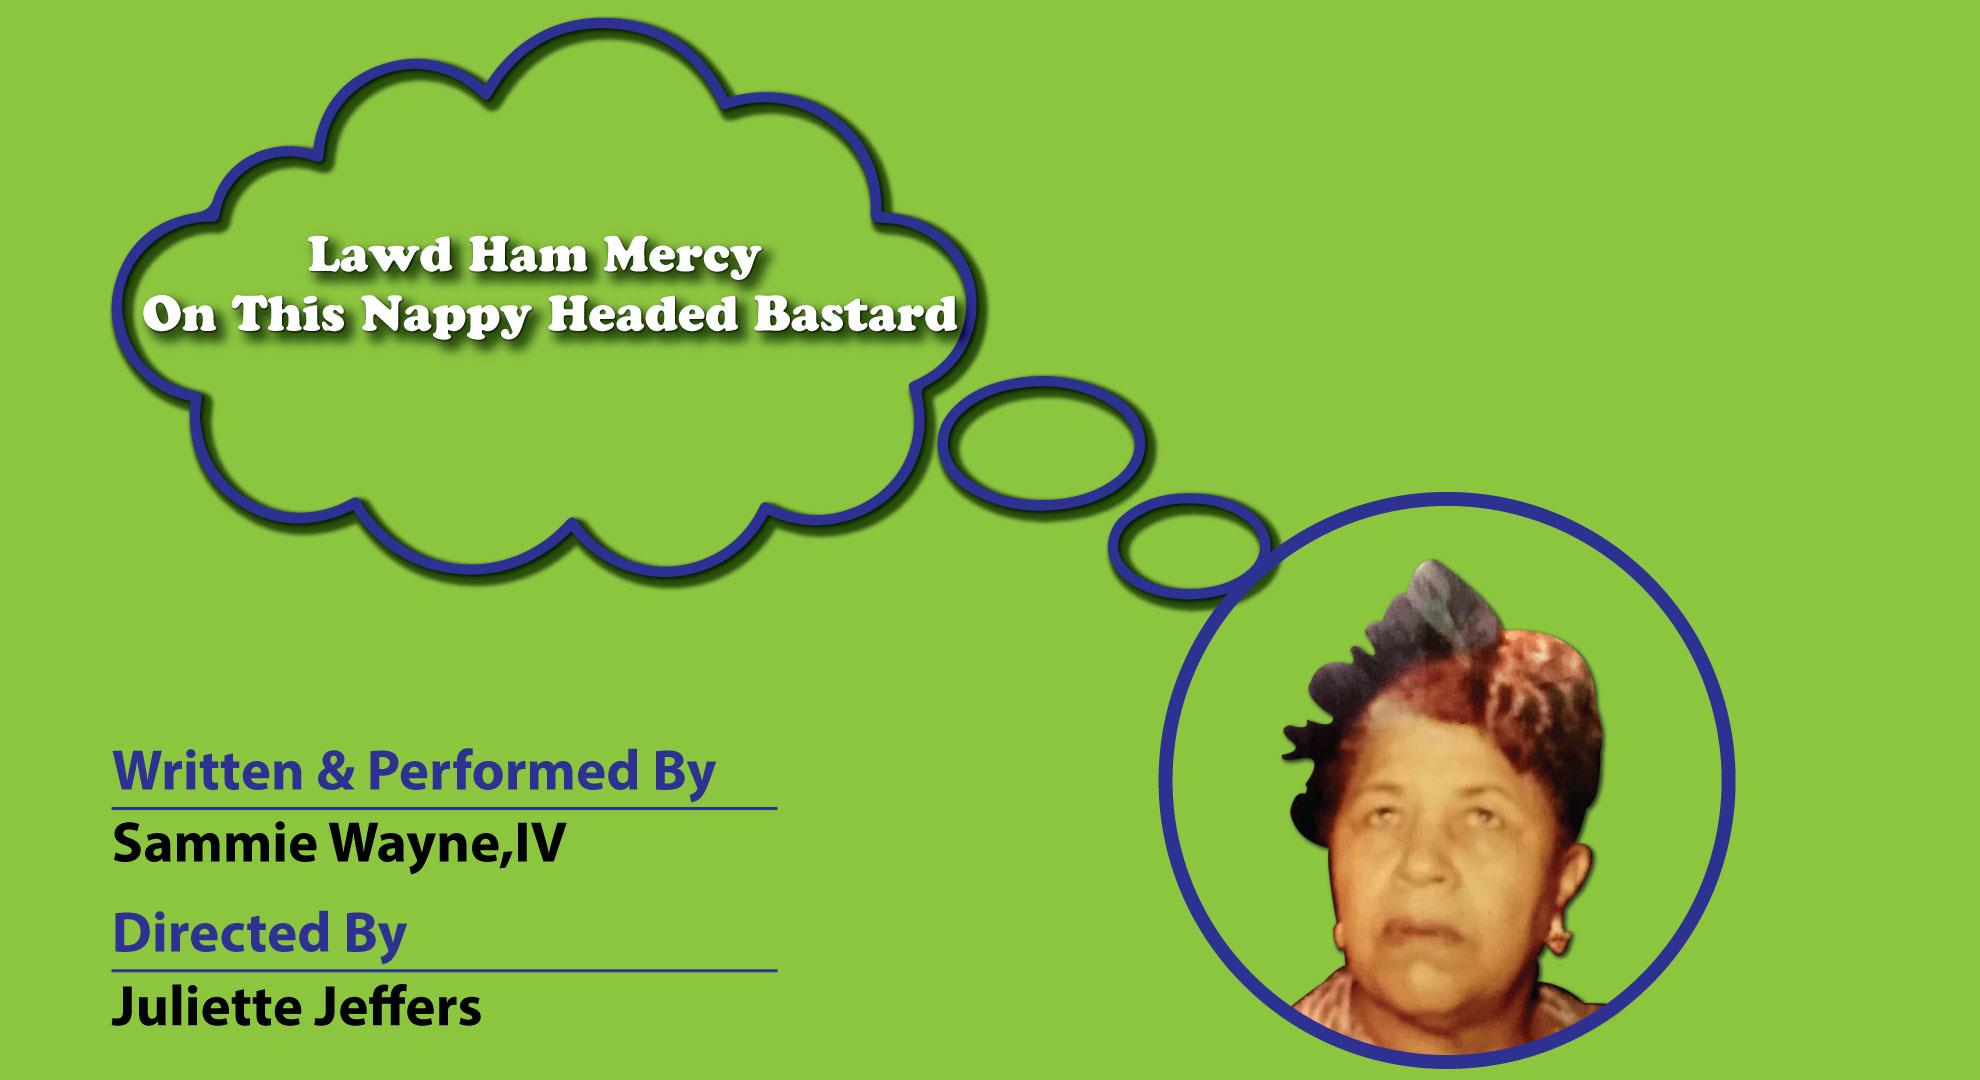 Lawd Ham Mercy - Oct 29 @ 7pm PST